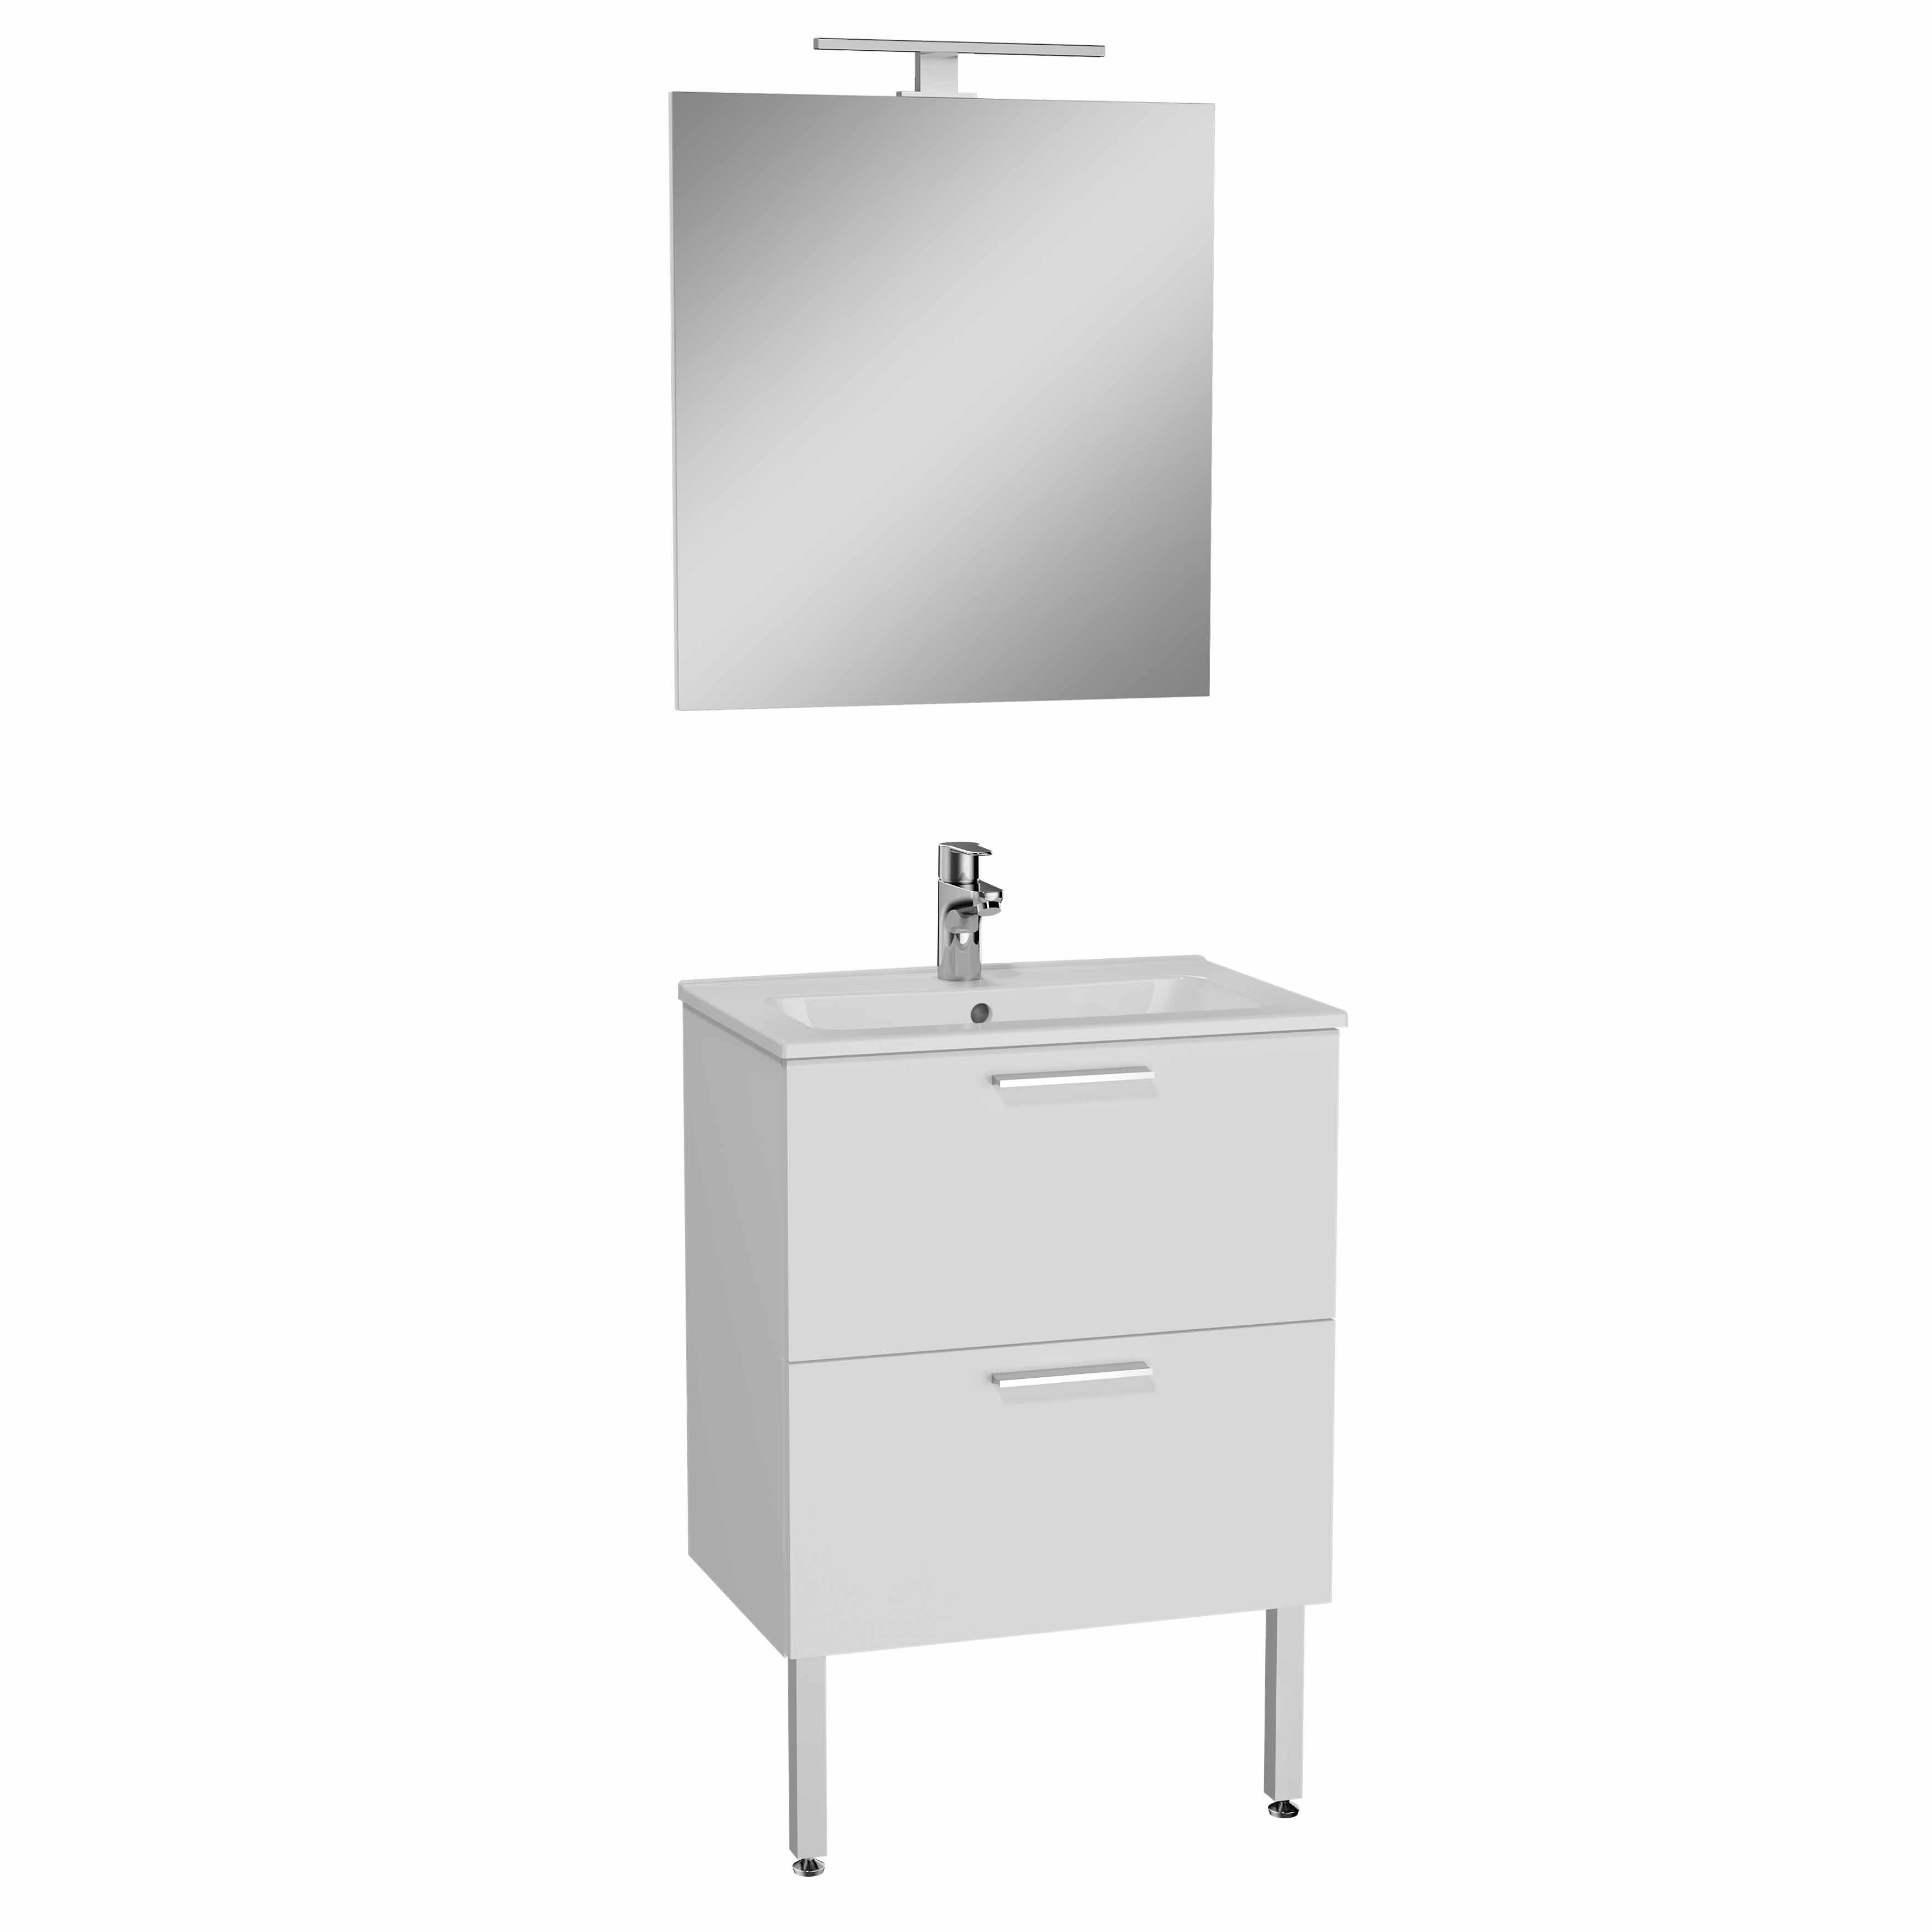 Mia set de meuble, avec 2 tiroirs, 60 cm, blanc